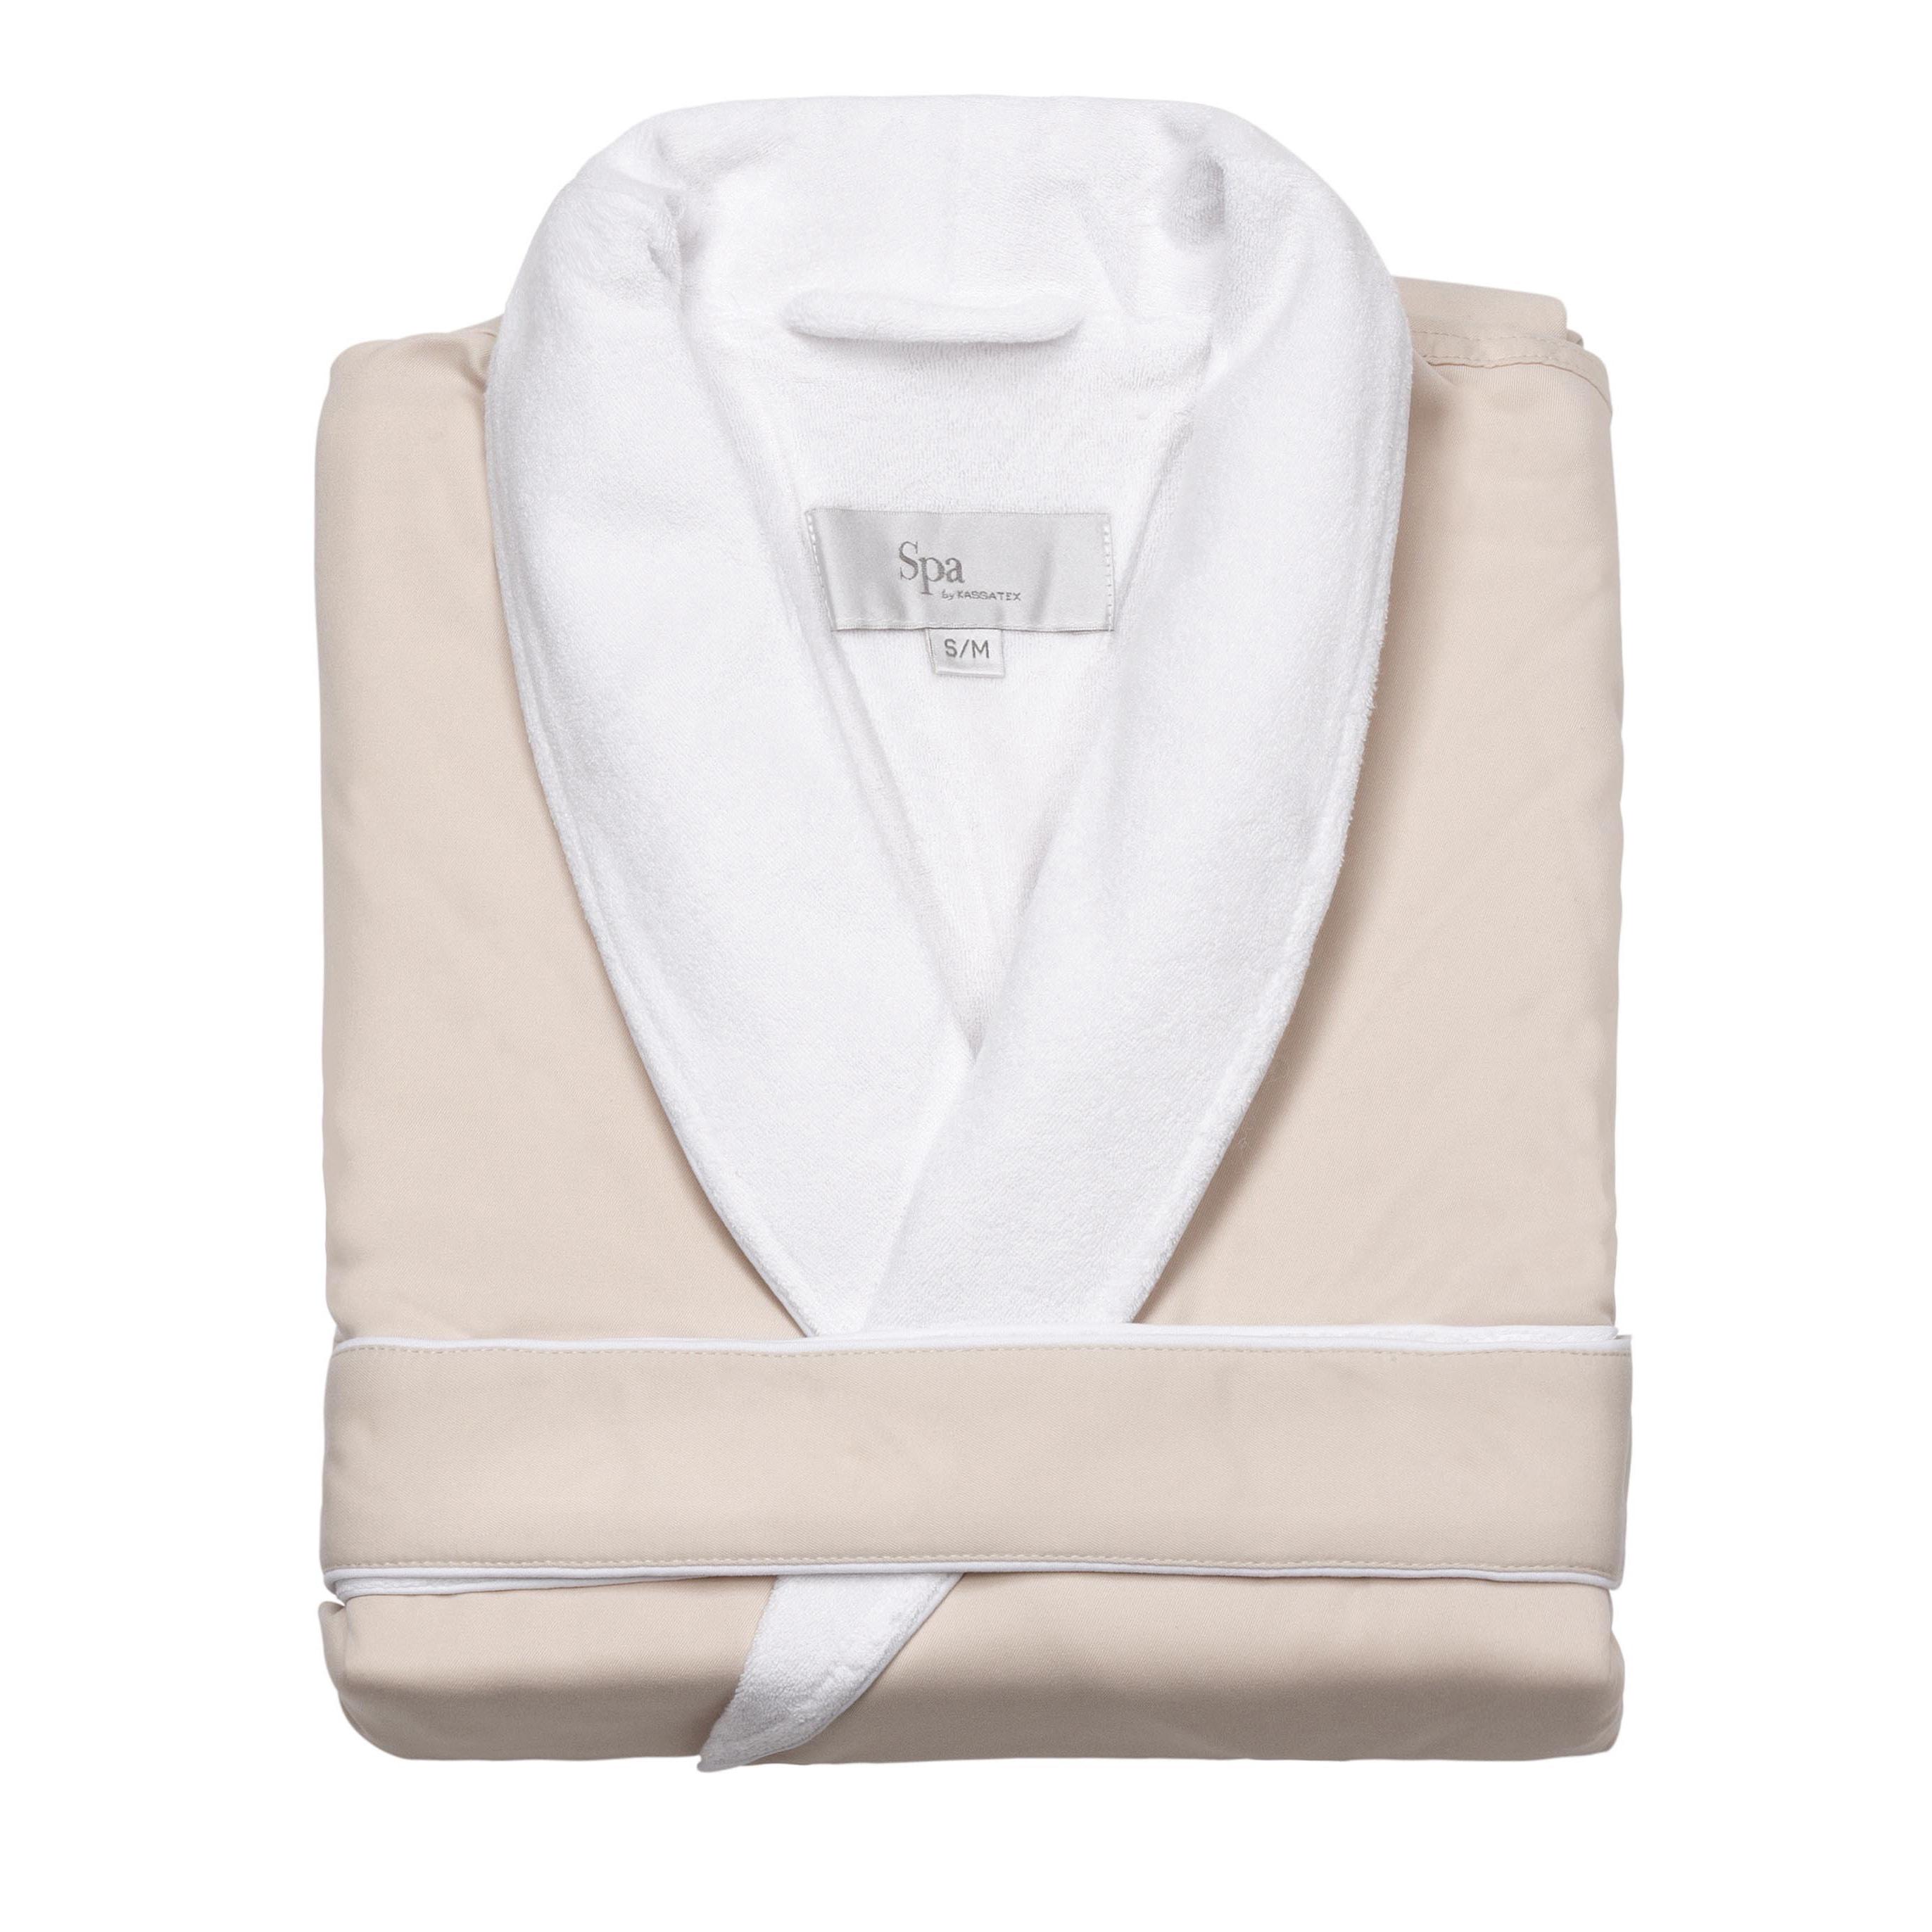 Luxurious Spa Bath Robe S/M (Cream), Women's, Size: S-M, ...